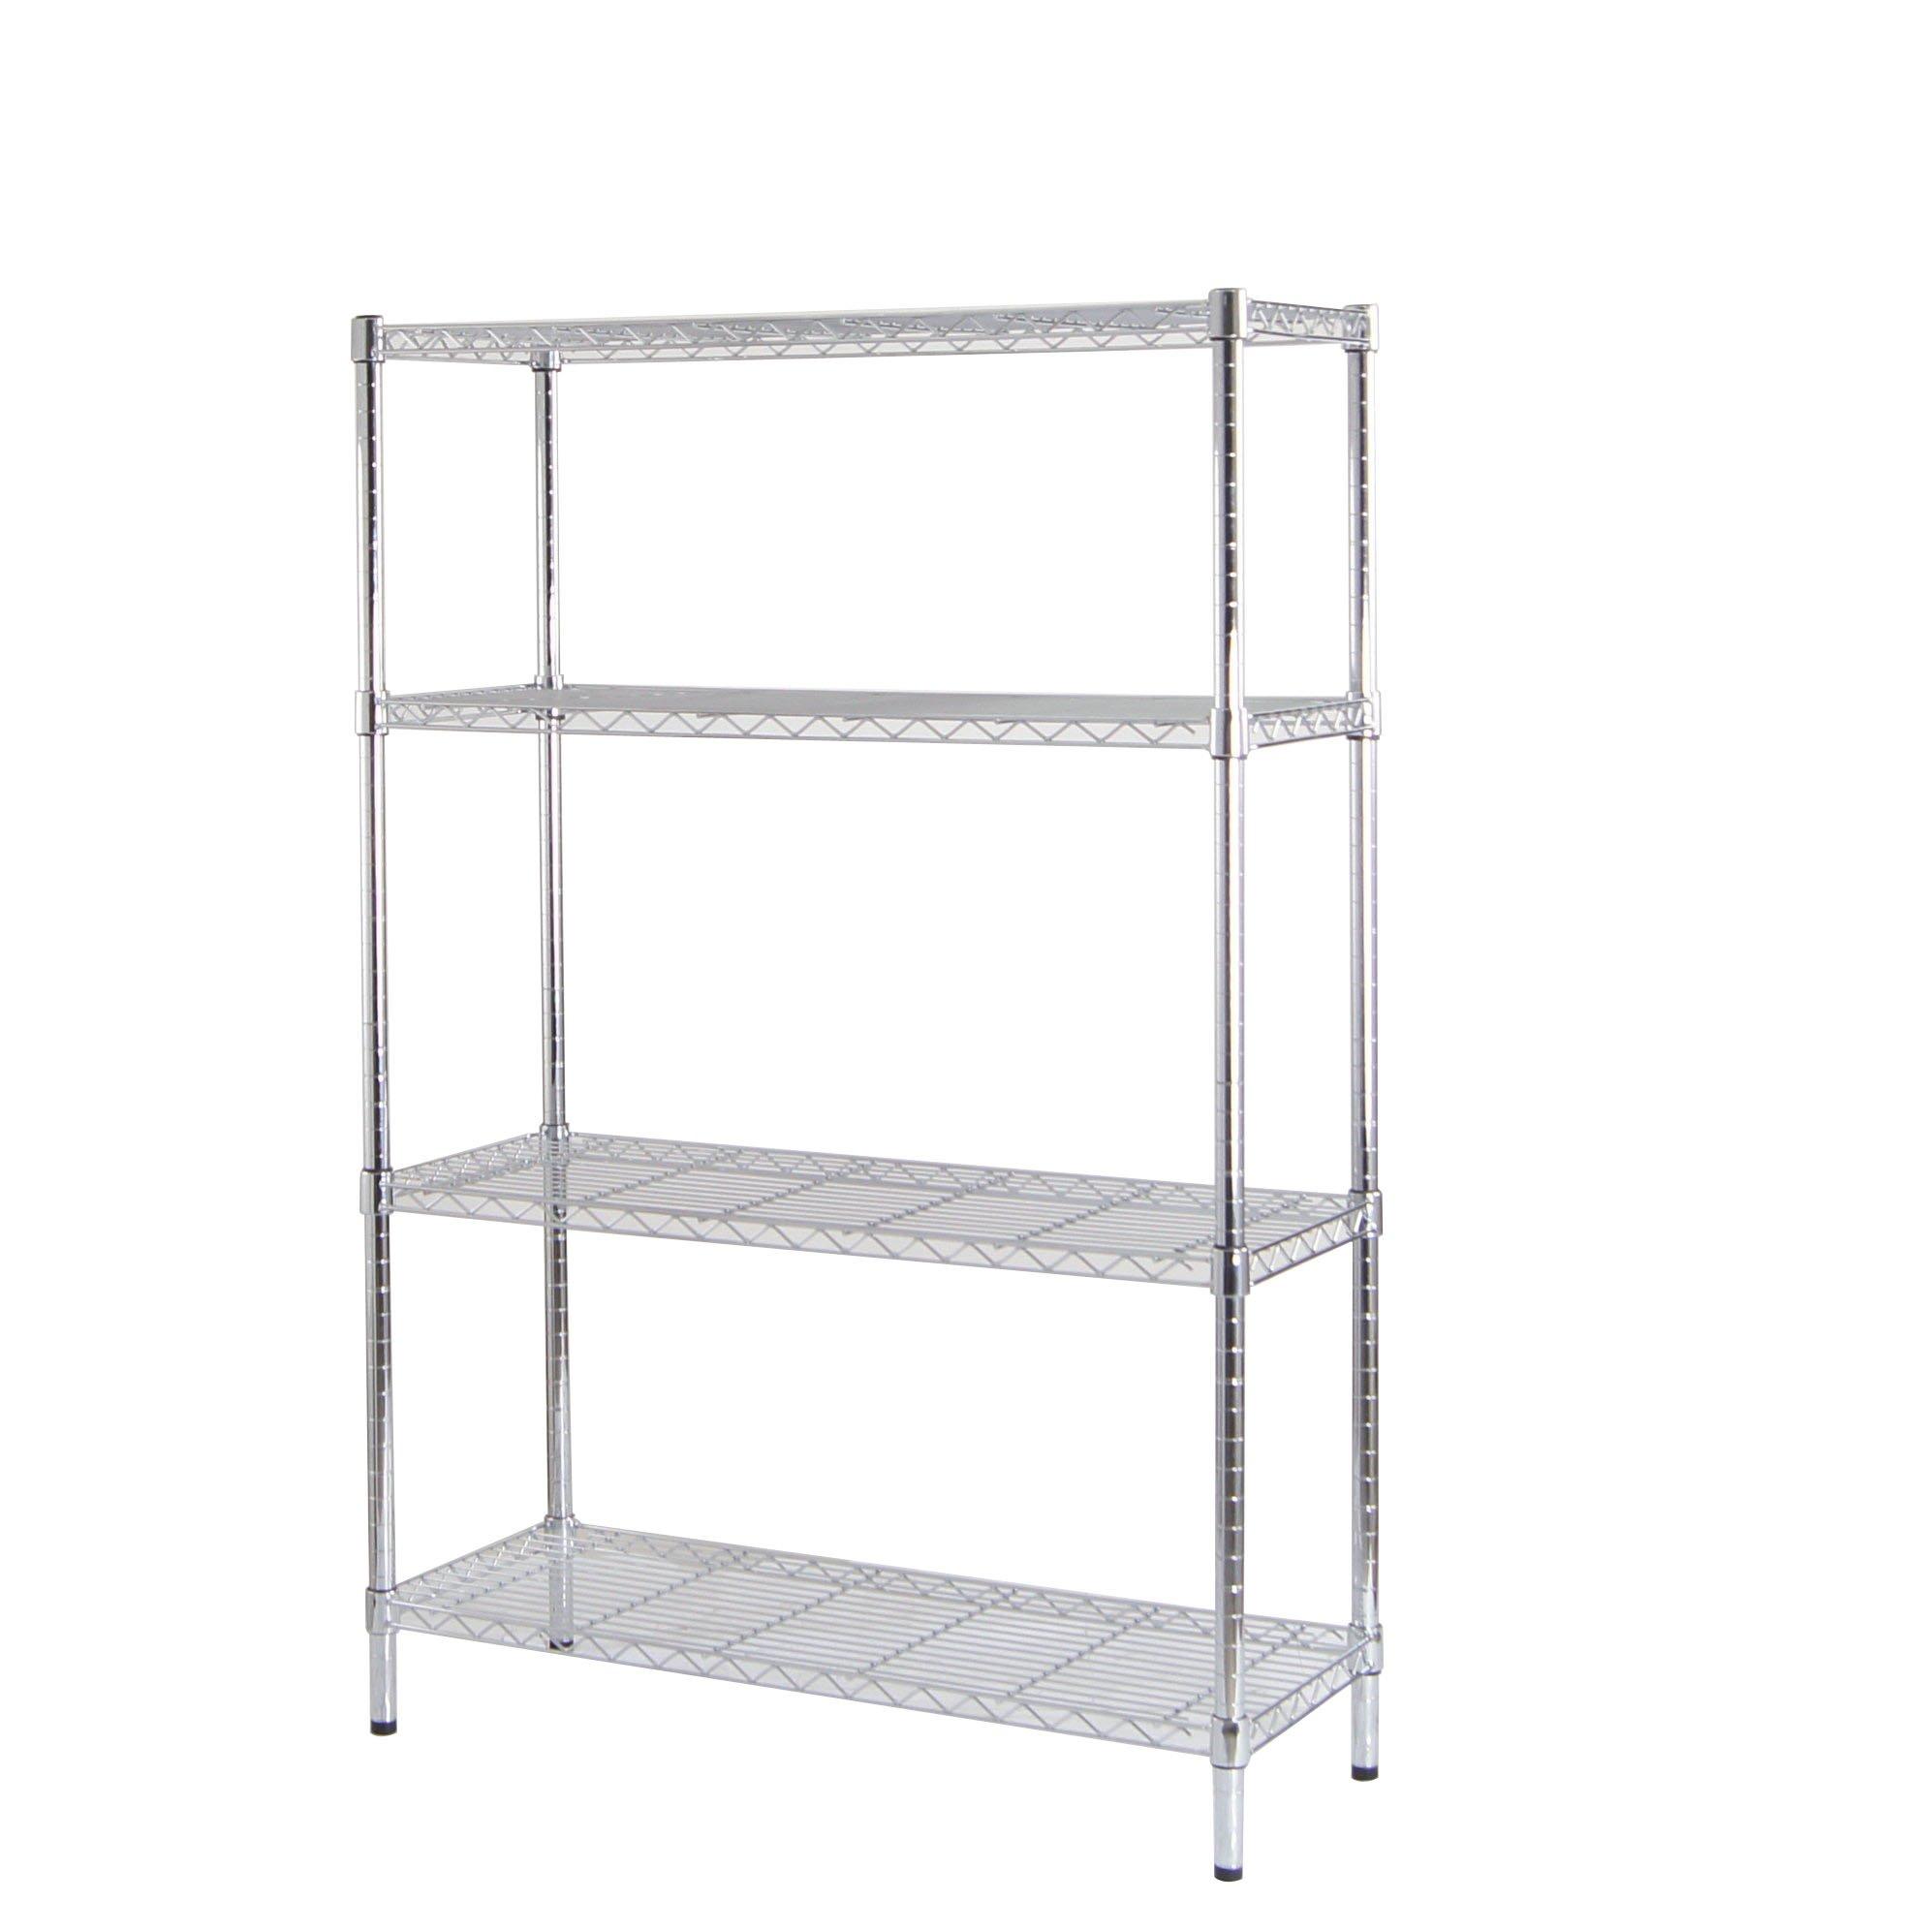 BuyHive Wire Shelving 4-Tier Garage Workshop Storage Rack Heavy Duty Adjustable Organization Shelf